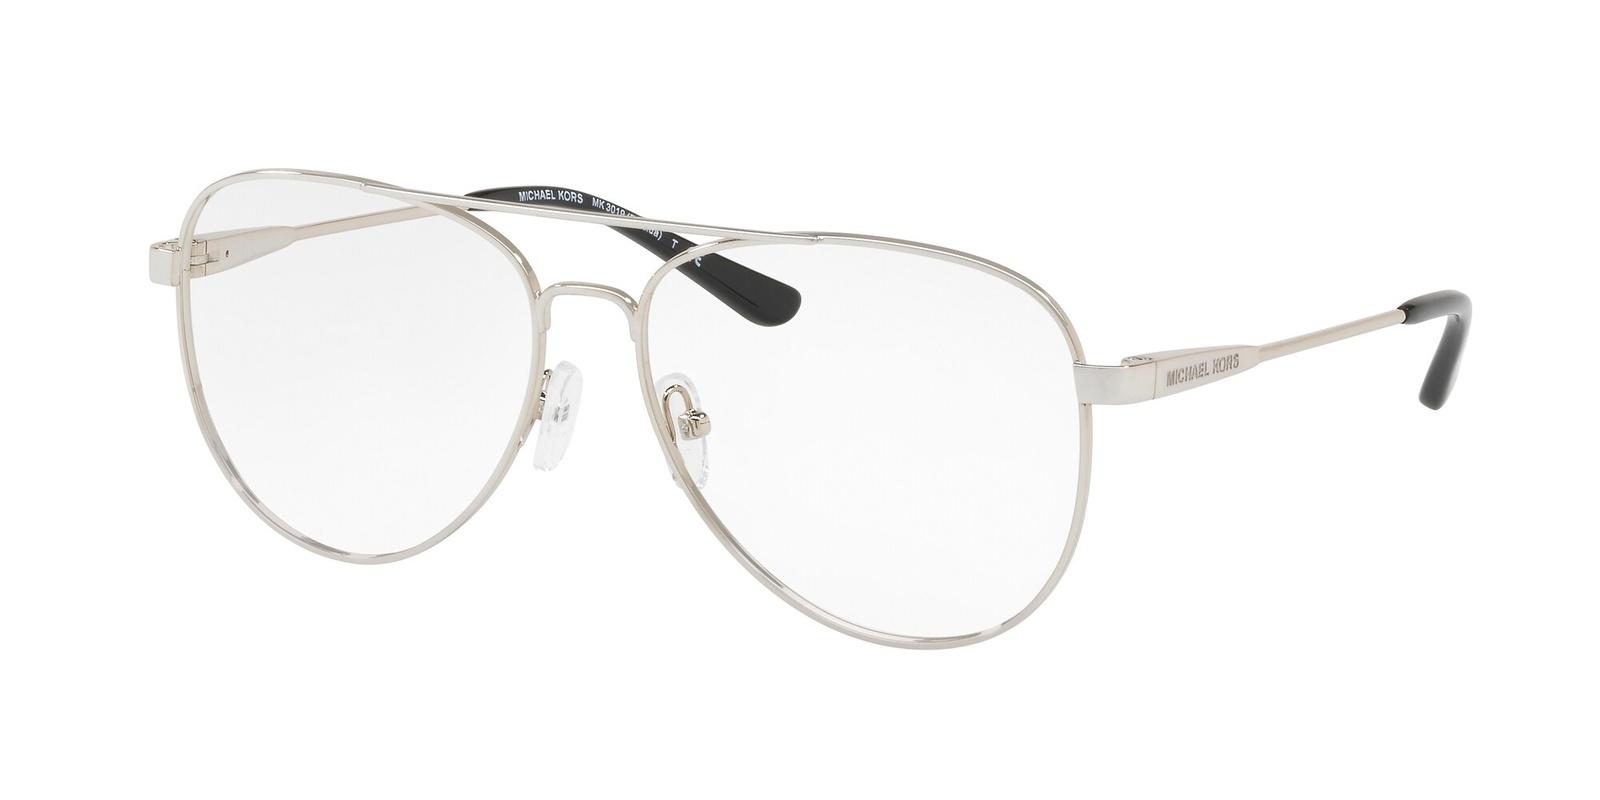 Michael Kors MK3019 eyeglasses